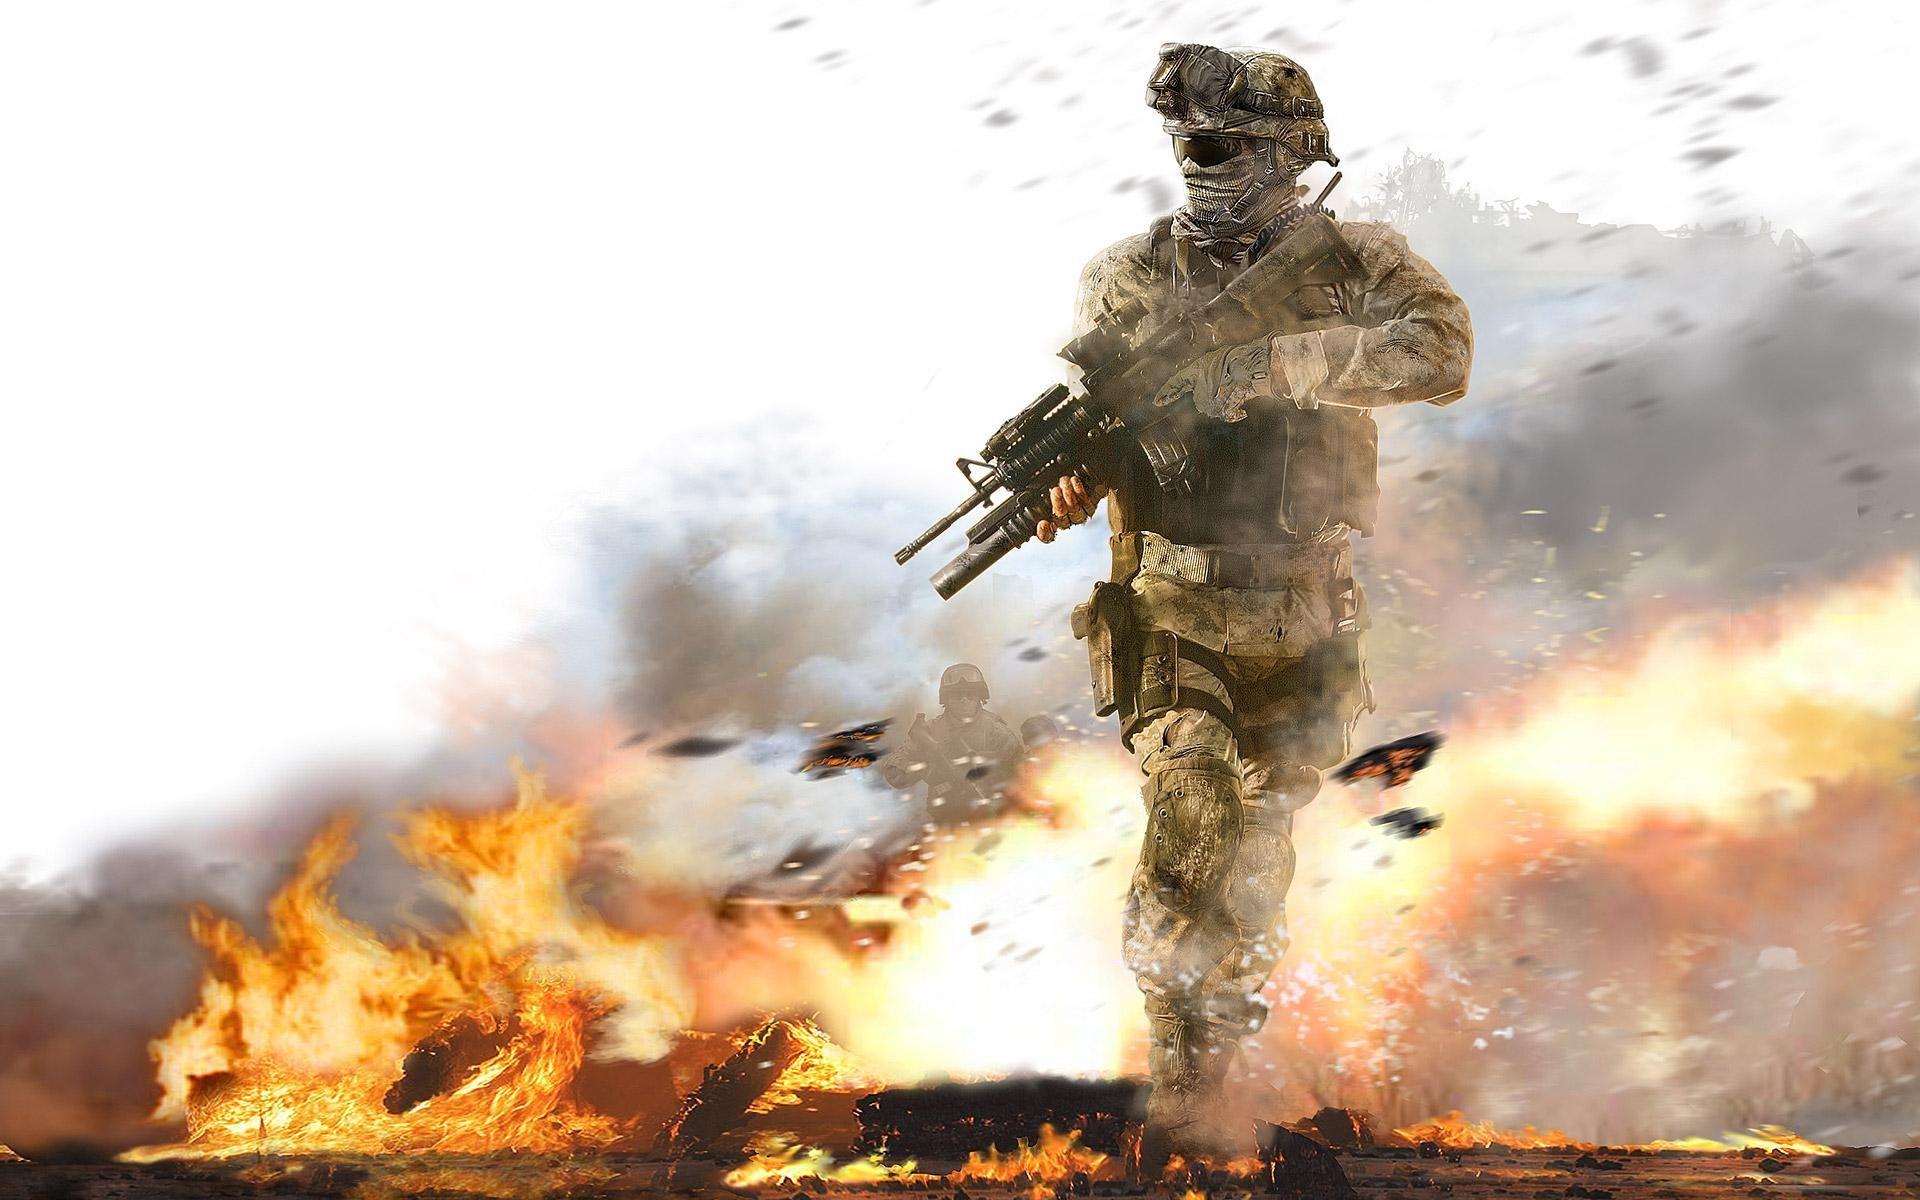 Download wallpaper: wallpapers for desktop, american soldier, american US soldier  wallpaper